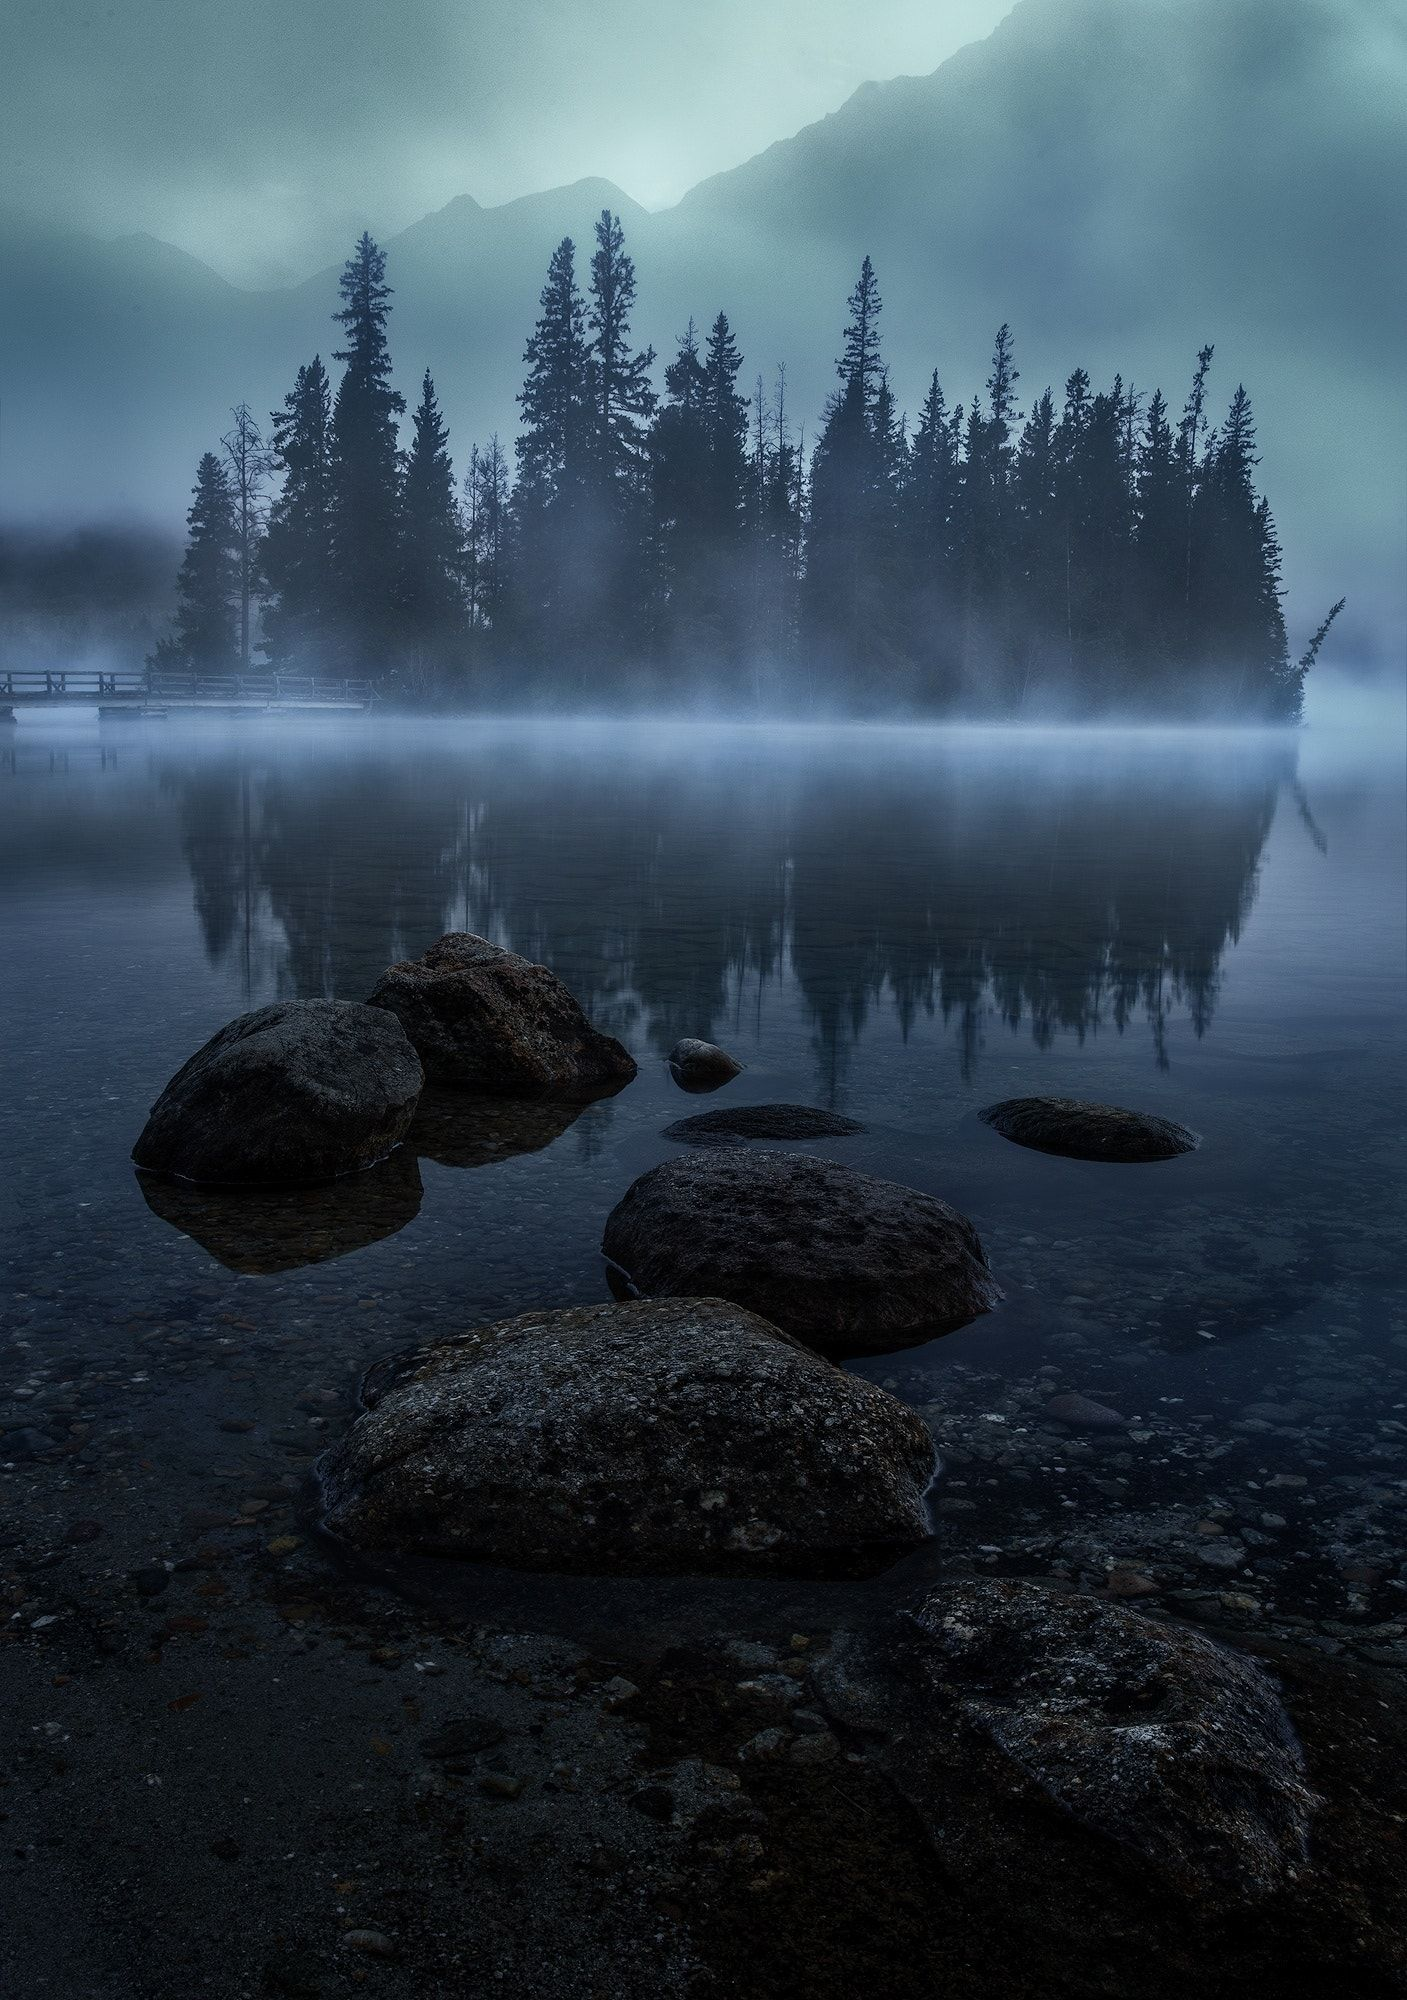 Misty Island Null Foggy Mountains Misty Mountain Photography